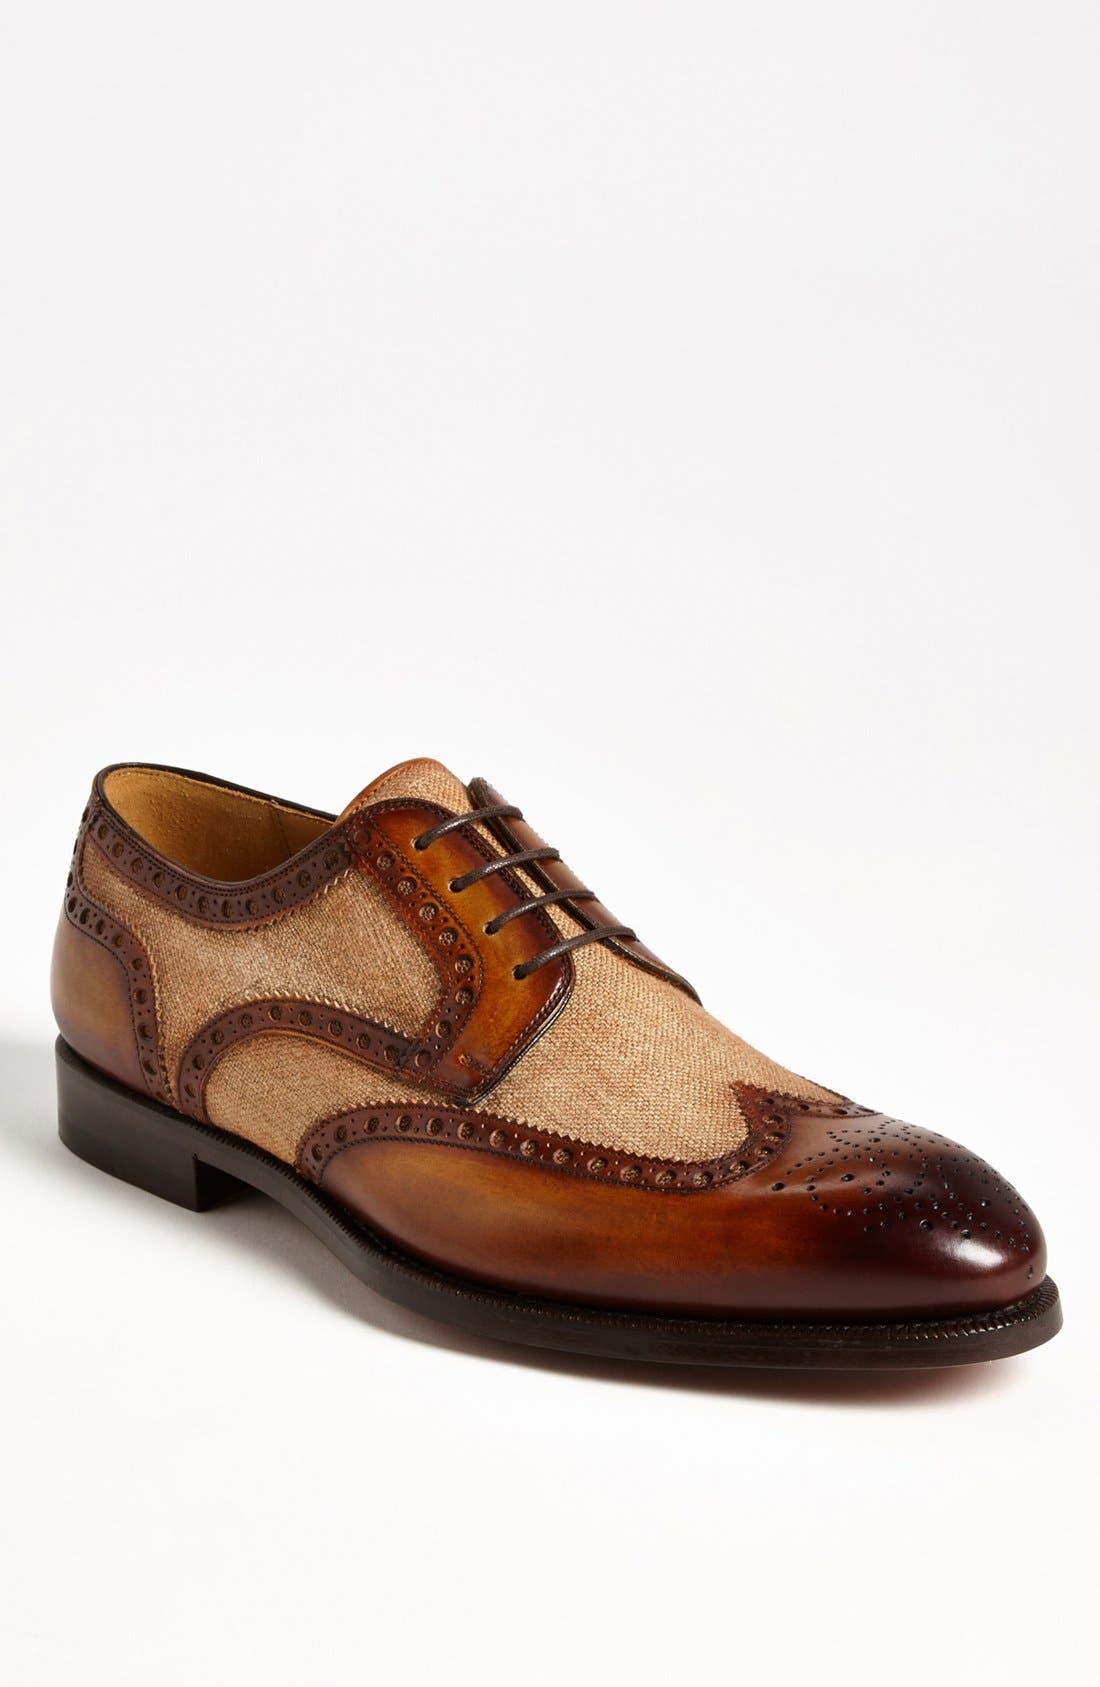 Main Image - Magnanni 'Artea' Spectator Shoe